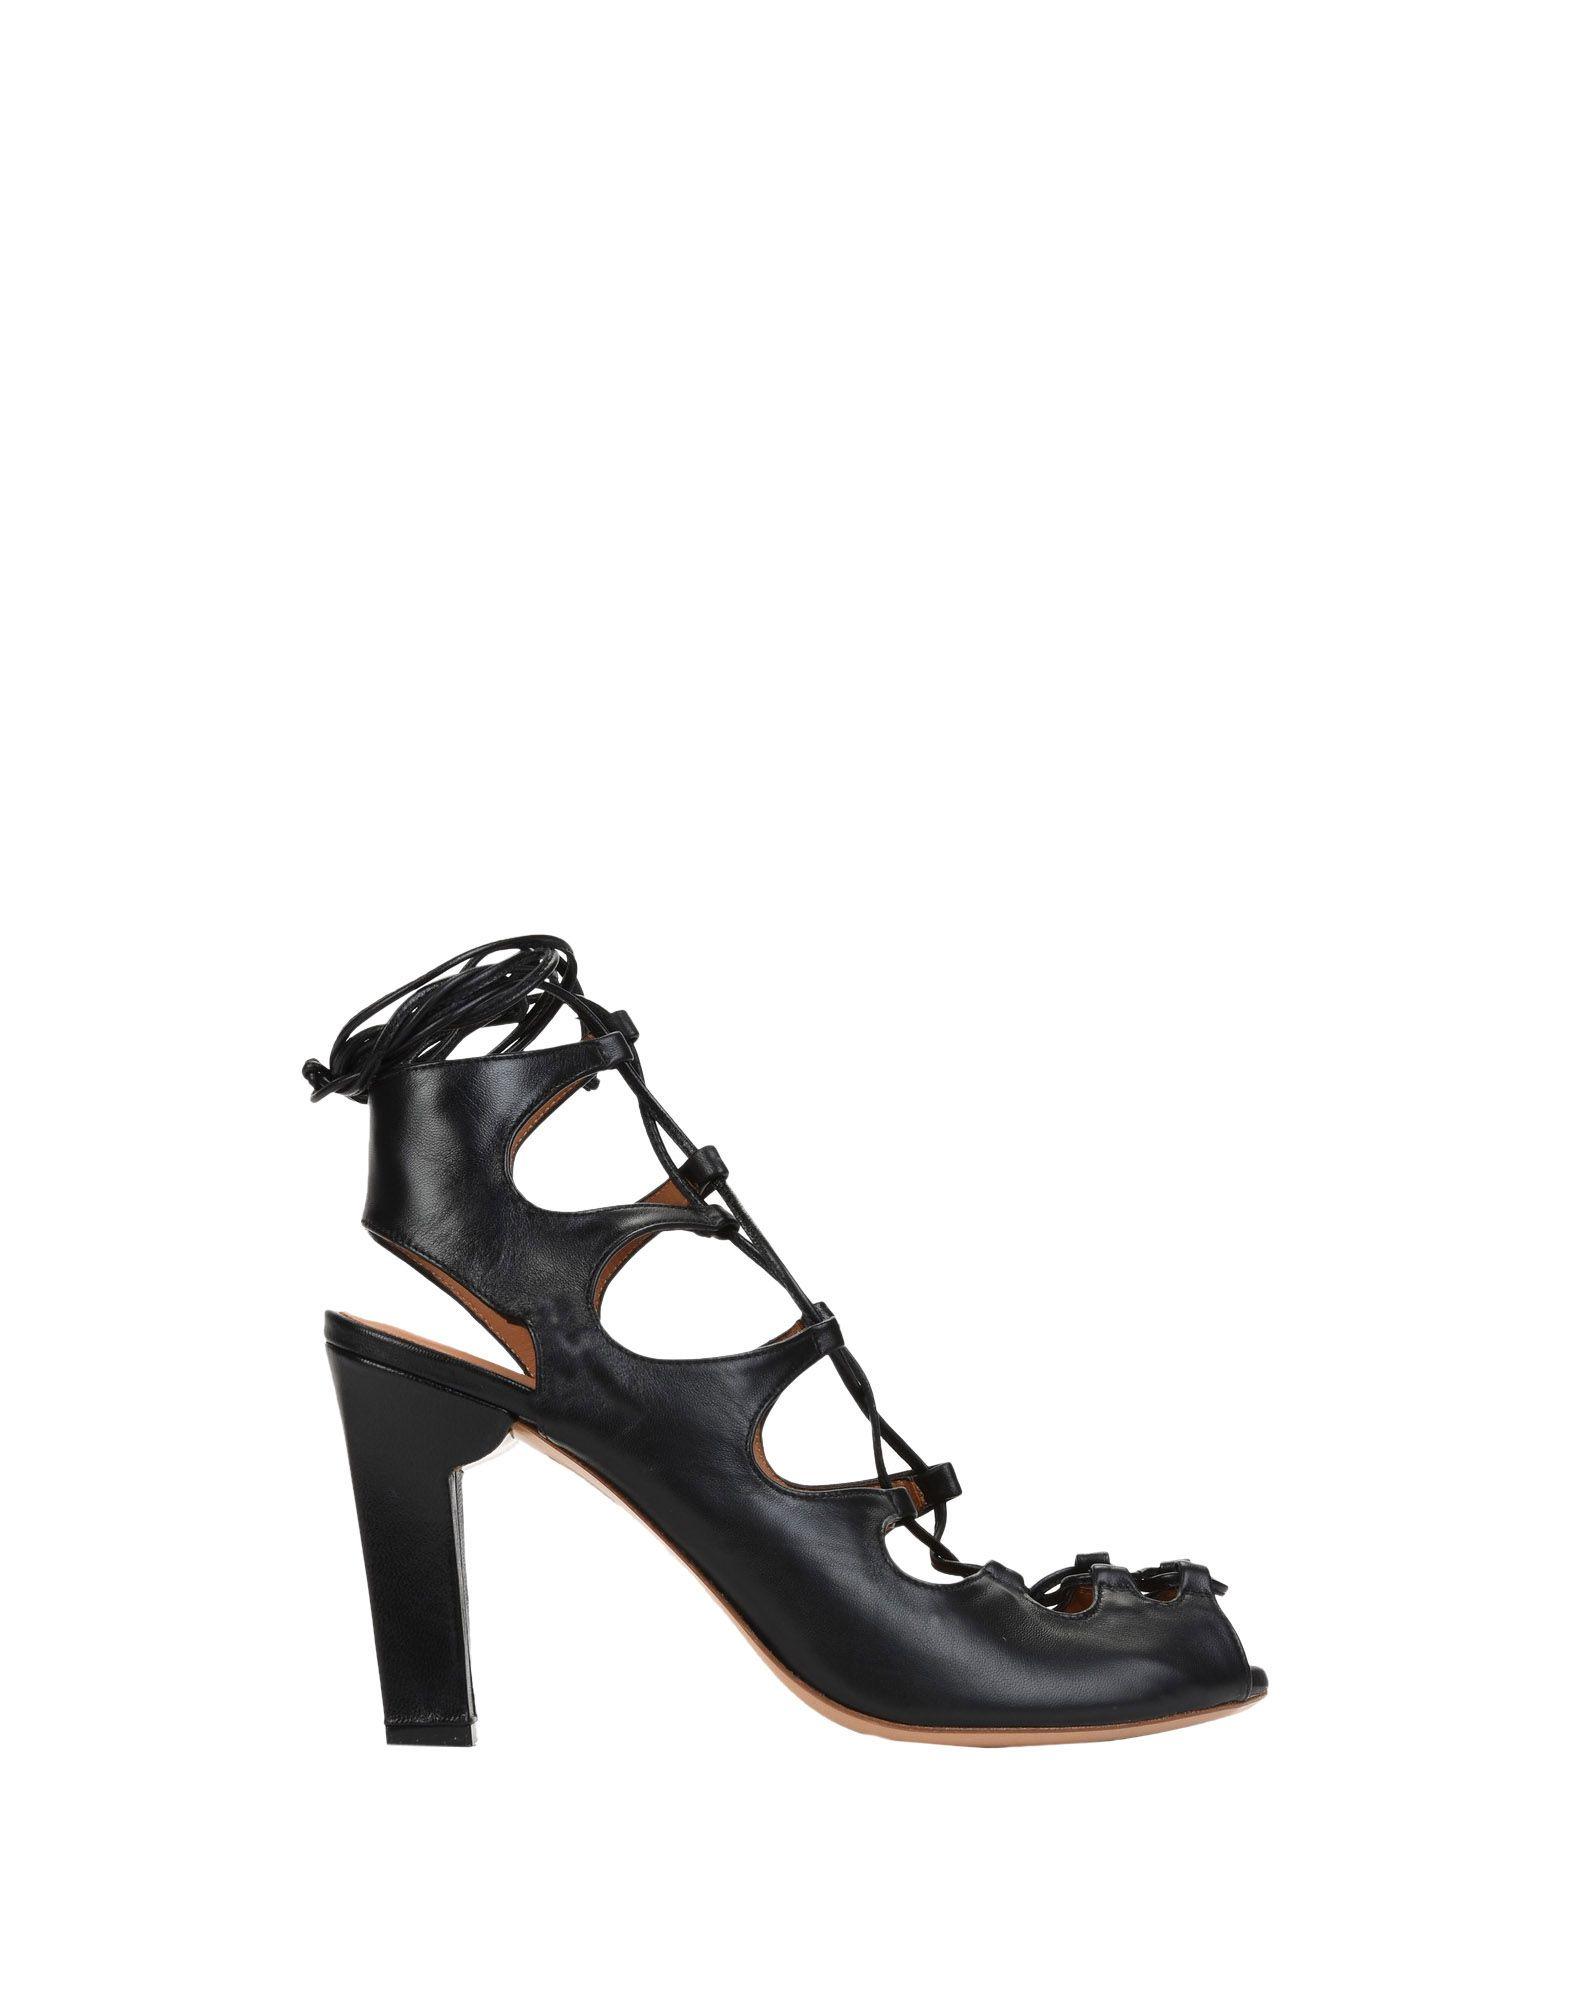 ... Sandales Chie By Chie Mihara Chie_Apasi1 - Femme - Sandales Chie By Chie  Mihara sur ...